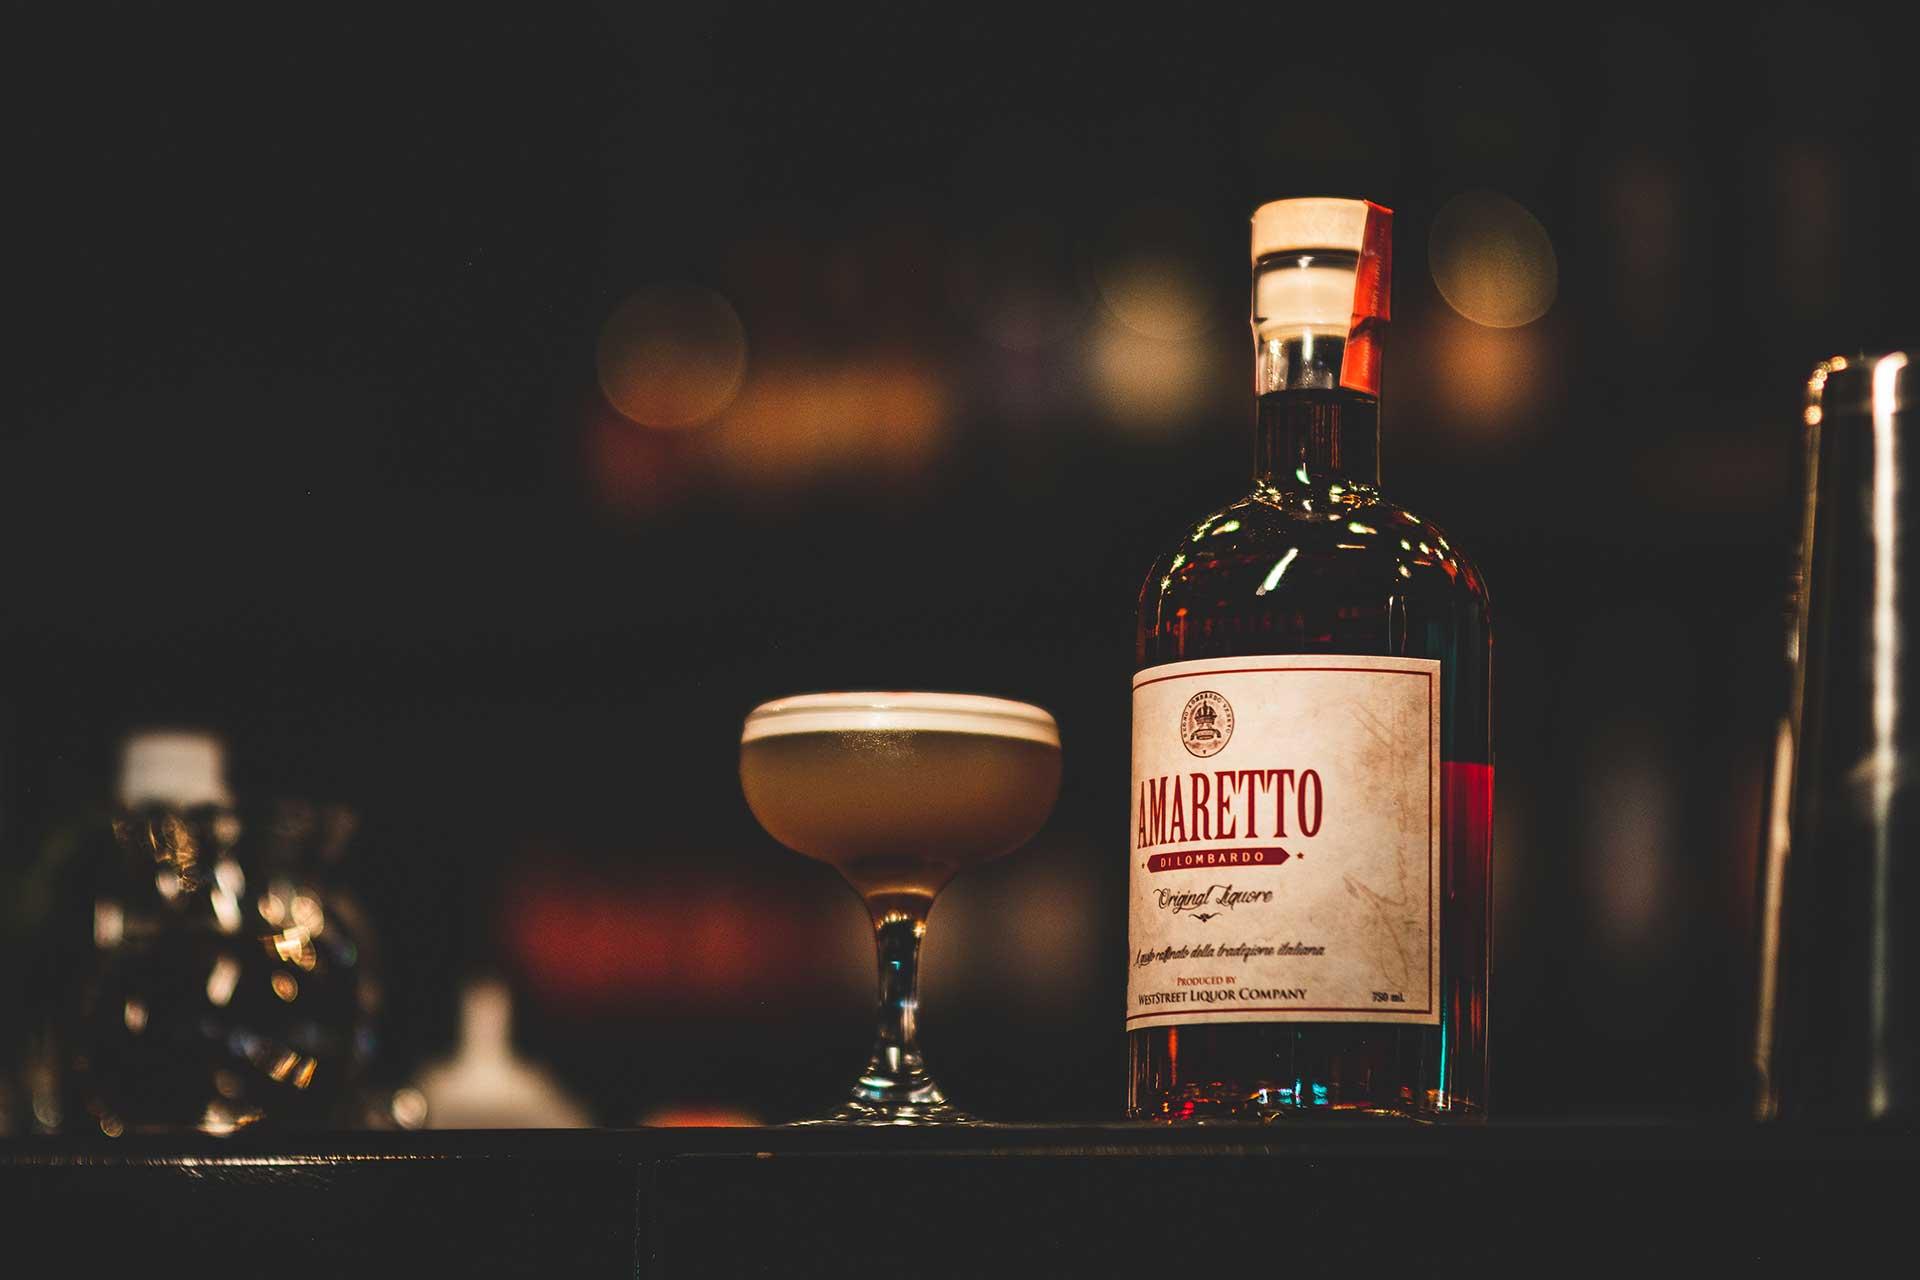 https://weststreetliquorcompany.com/wp-content/uploads/2020/02/WestStreet-Liquor-Company-Drinks-1-30.jpg